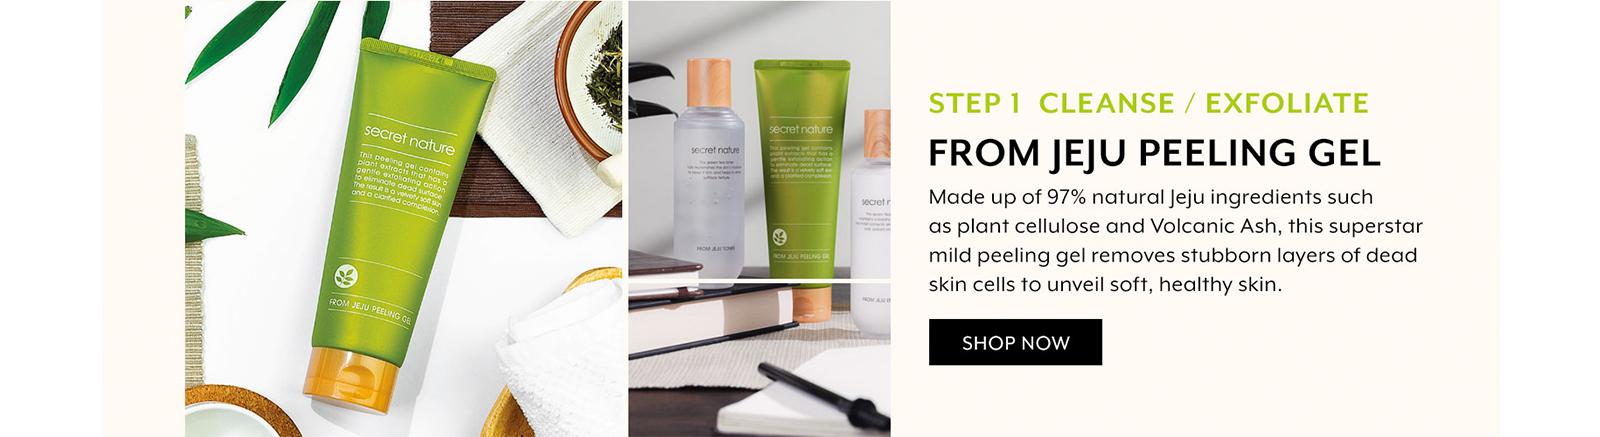 Aug 2018: secret nature Star Products 1